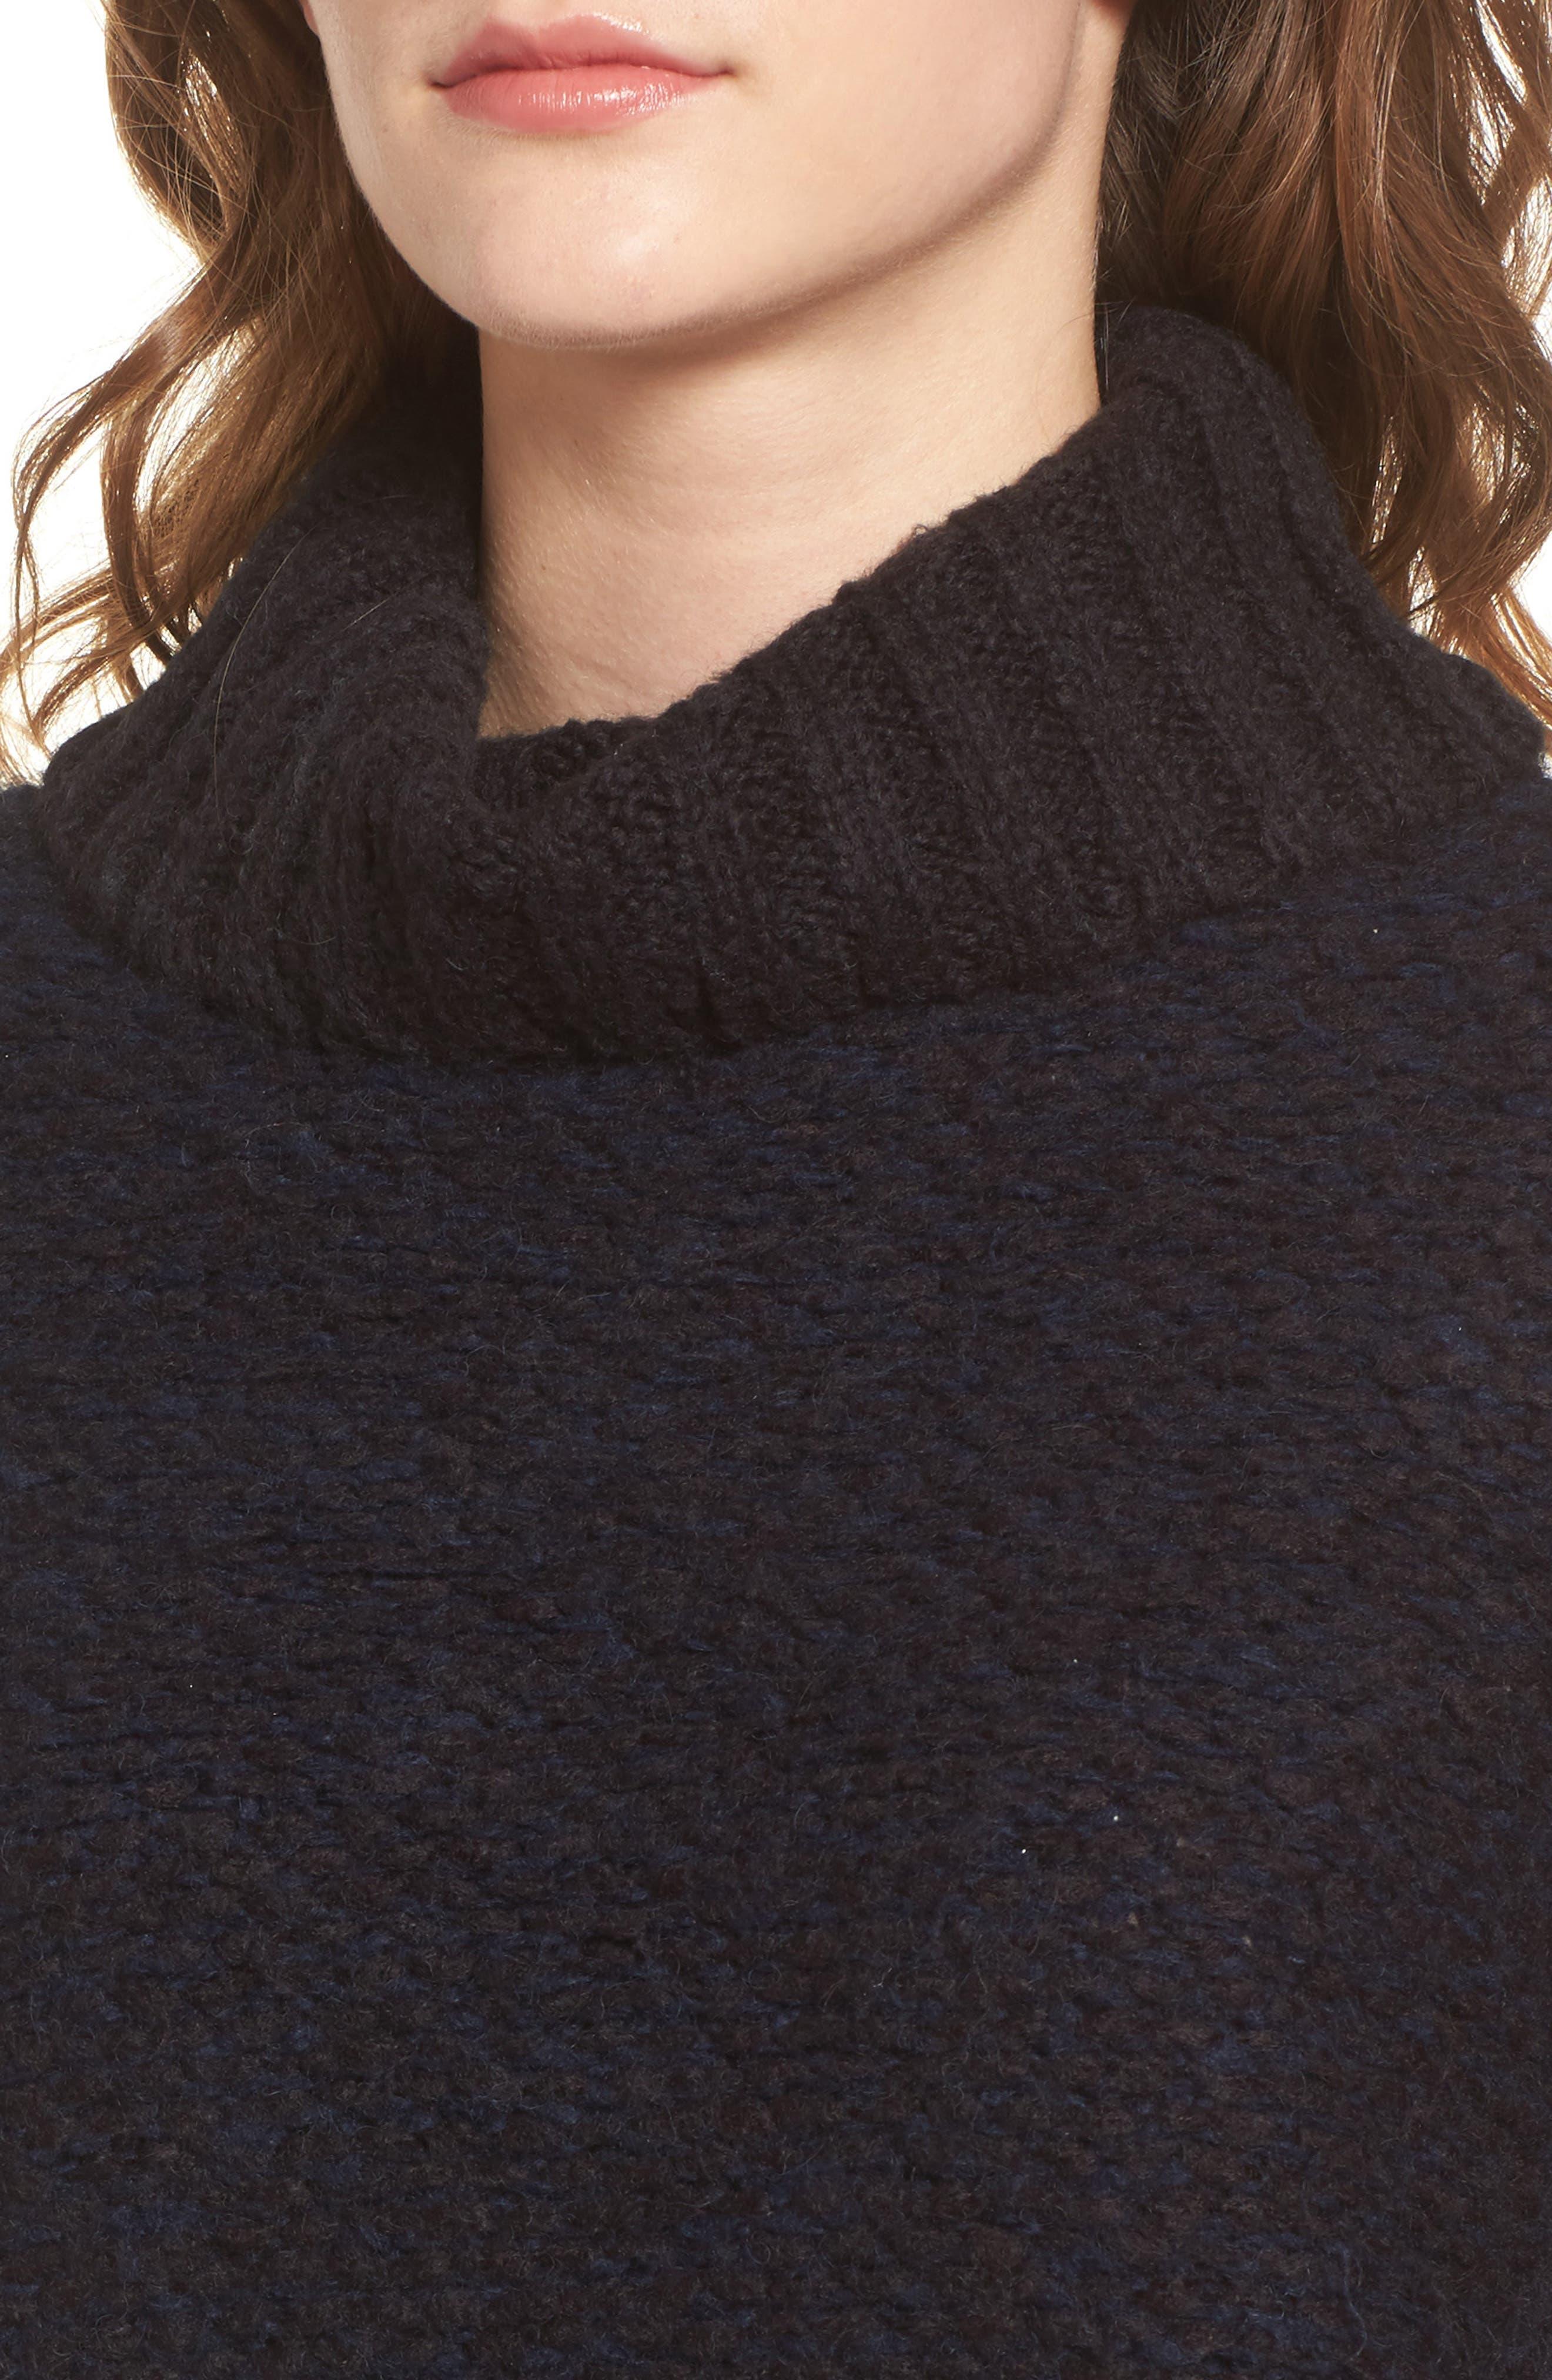 Kinks Turtleneck Sweater,                             Alternate thumbnail 7, color,